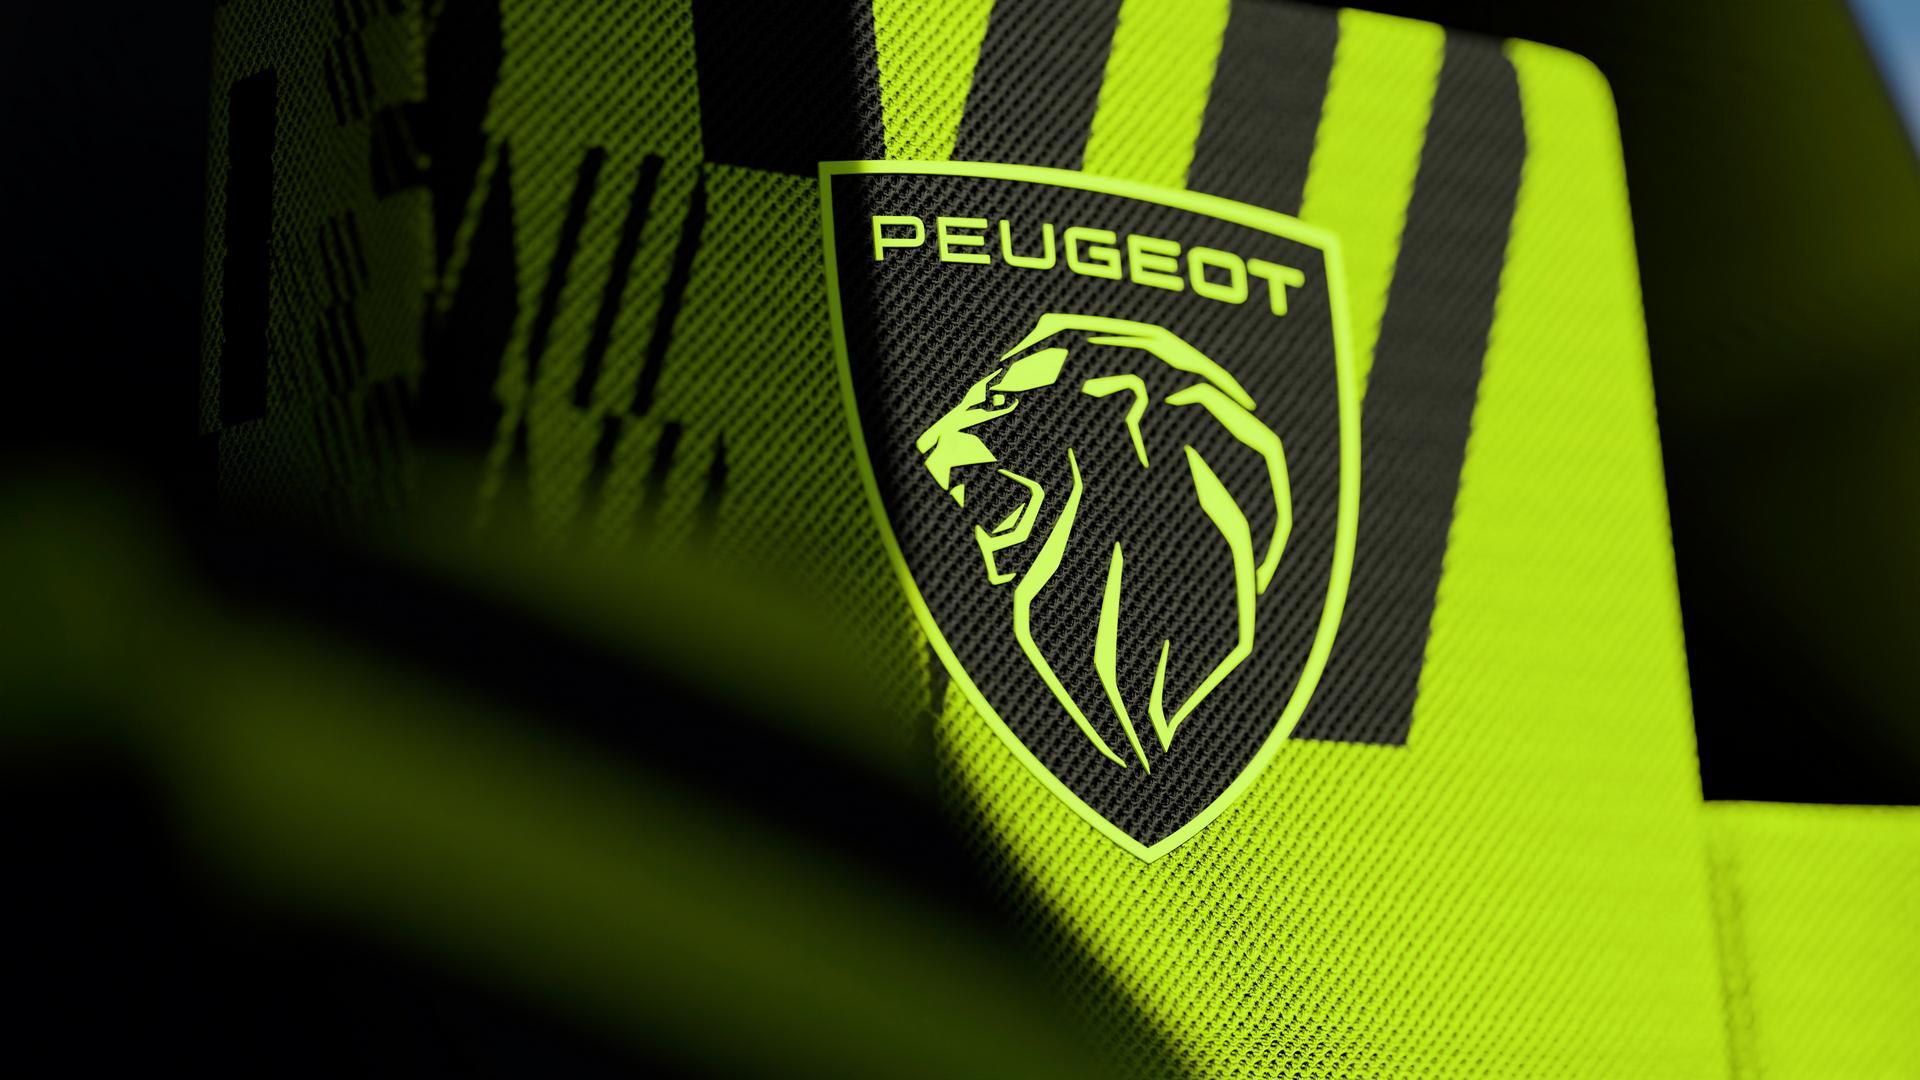 PEUGEOT 9X8 logo